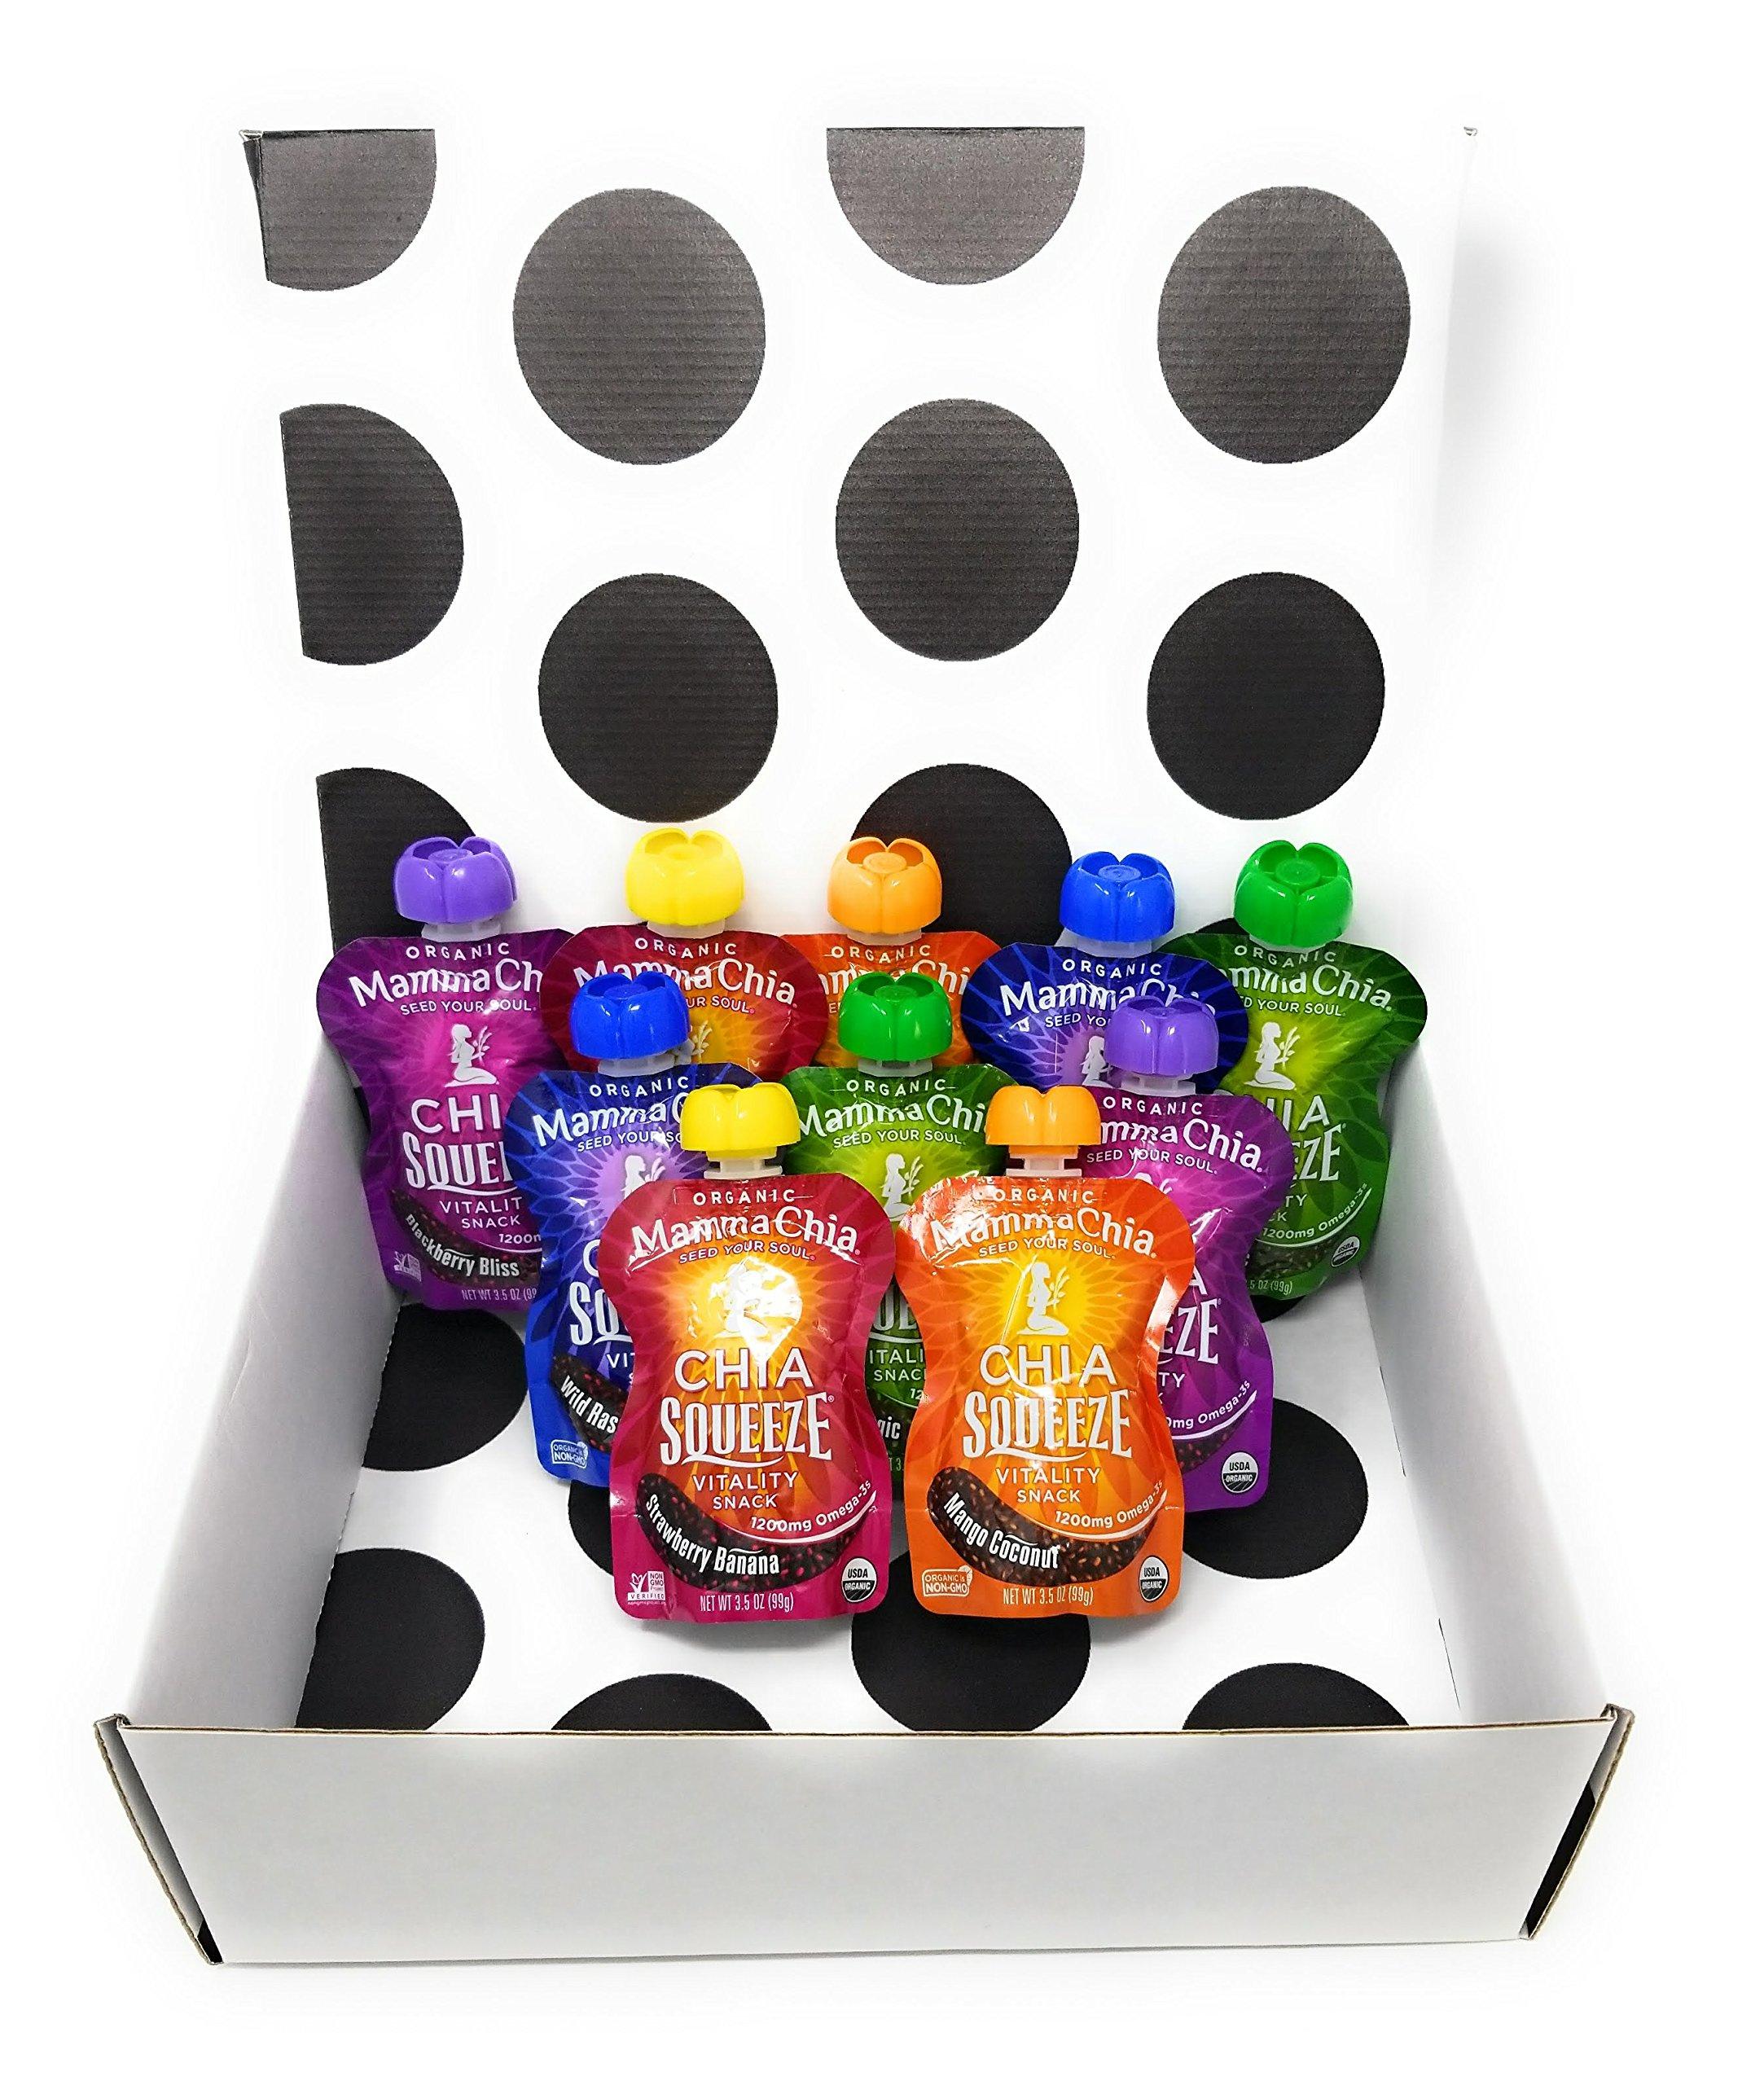 Mamma Chia Organic Squeeze Vitality Snack Variety 10 Pack (Strawberry, Blackberry, Raspberry, Green, Mango)